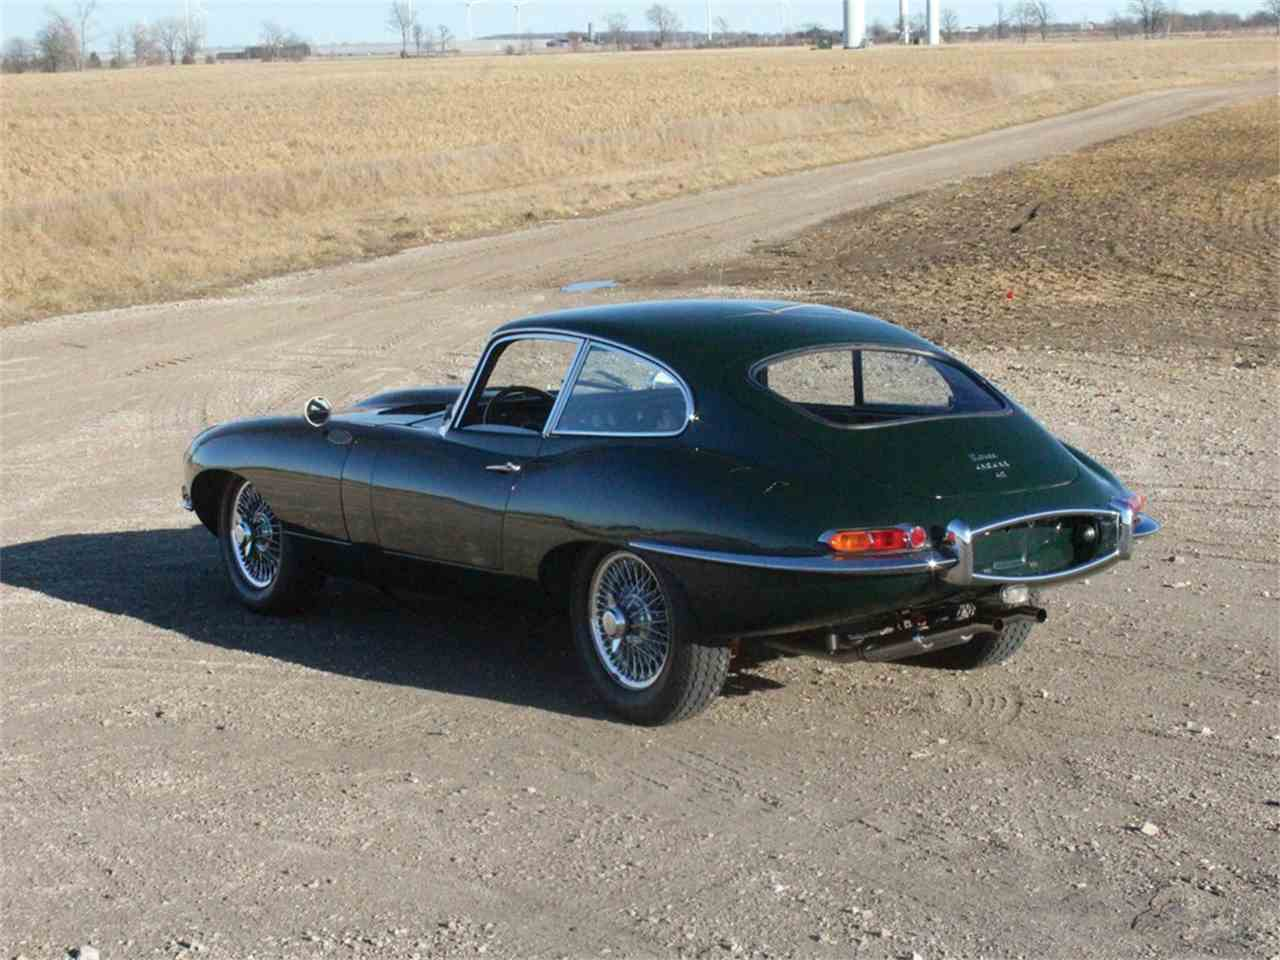 xk bw fort results roadster s lauderdale auction jaguar